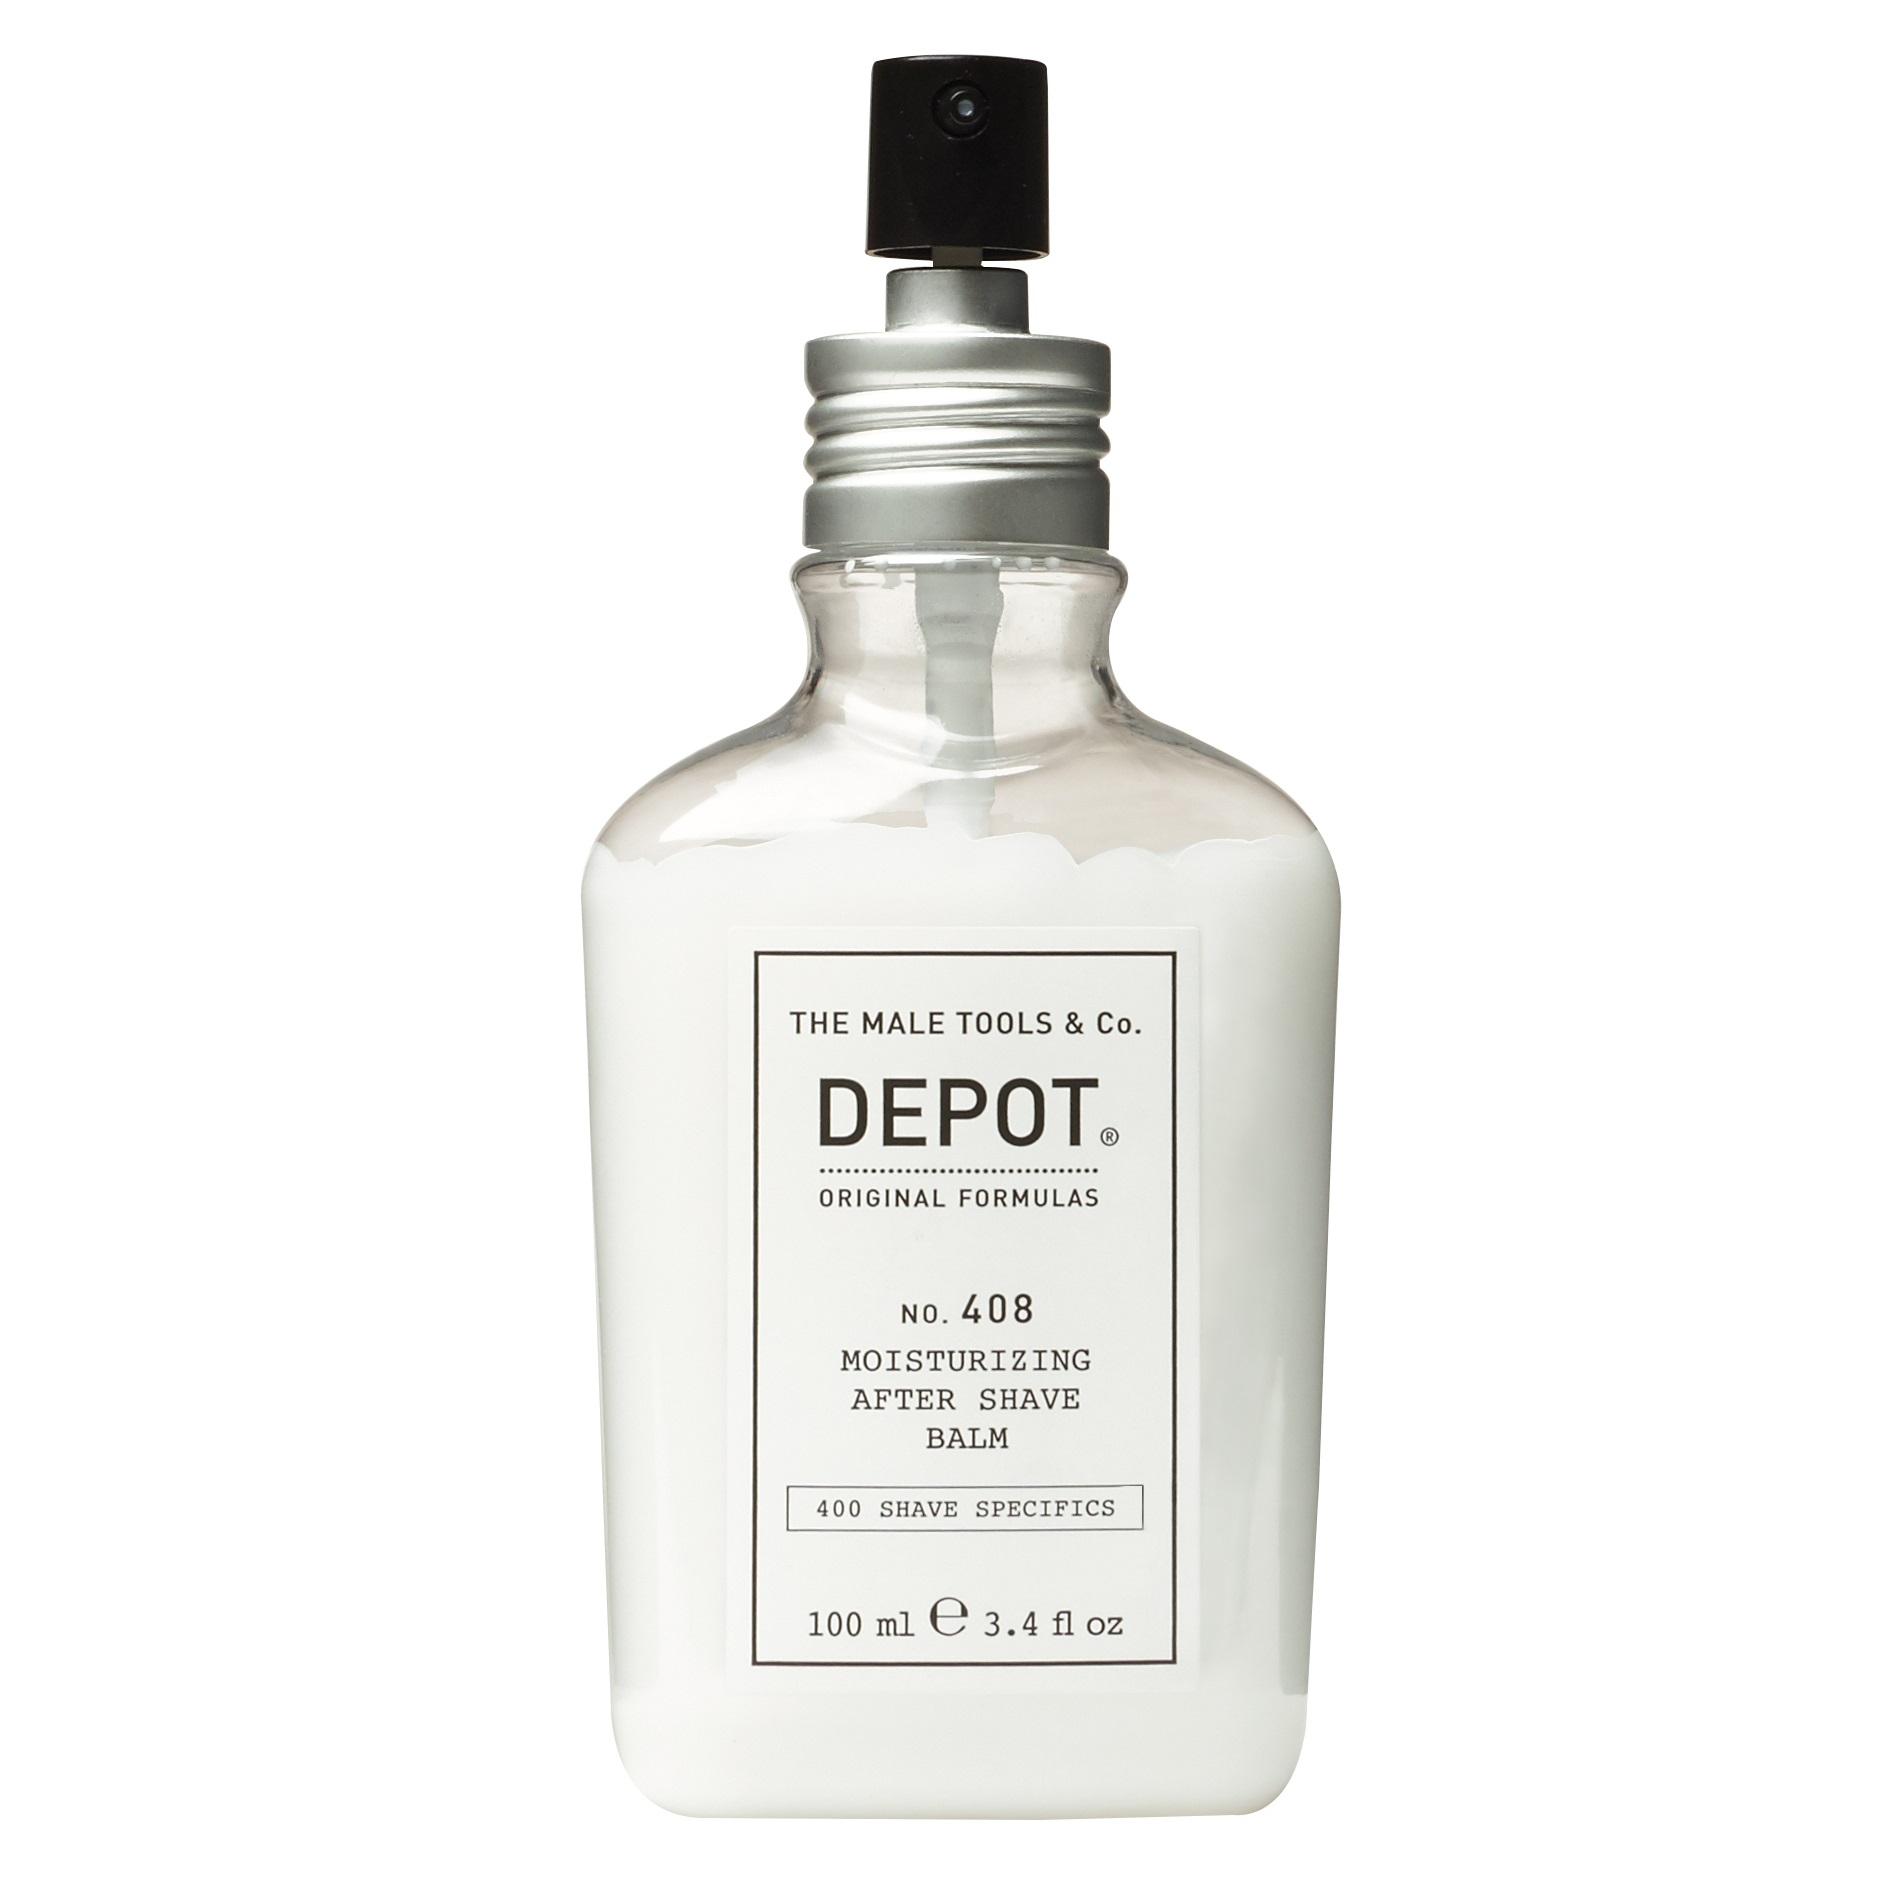 Depot - No. 408 Moisturizing After Shave Balm 100 ml